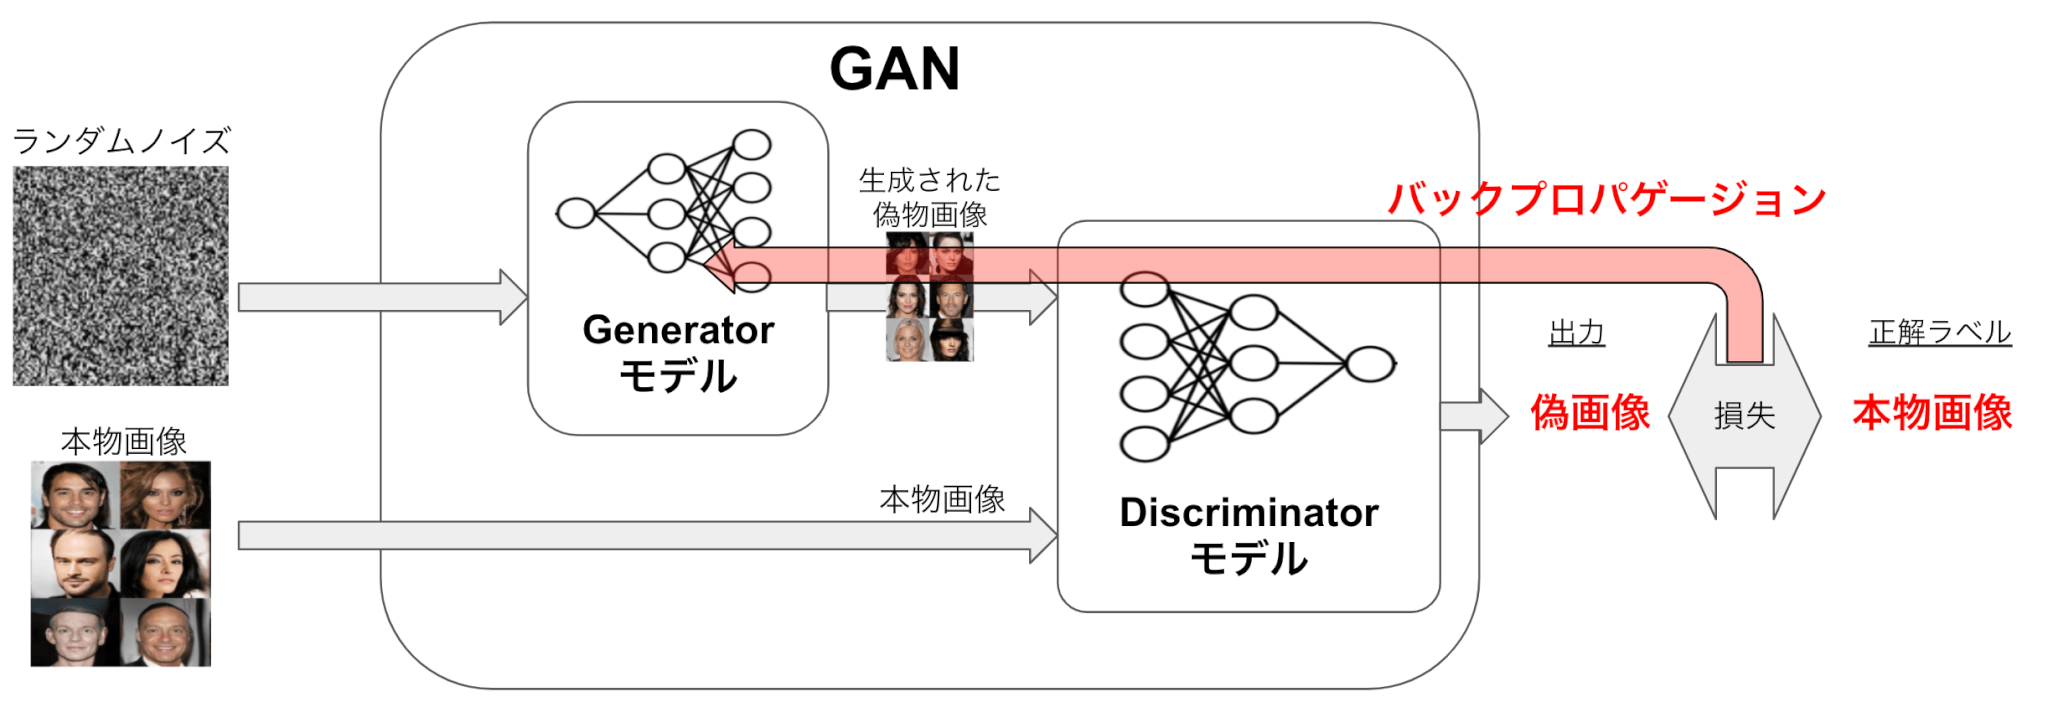 GANの学習の仕組み詳細 Gはノイズから画像を出力できるように、転置畳み込み層などを用いたニューラルネットワークを設定する。  Dは画像から本物/偽物のラベルを出力できるように、畳み込み層を用いたニューラルネットワークを設定する。(こちらは普通のCNNモデルと捉えても問題ない)  Dの出力と正解ラベル(偽画像か本物画像か)の損失を計算し、その損失をDとGにバックプロパゲーションを行うことによりGとDのネットワークの学習を行う